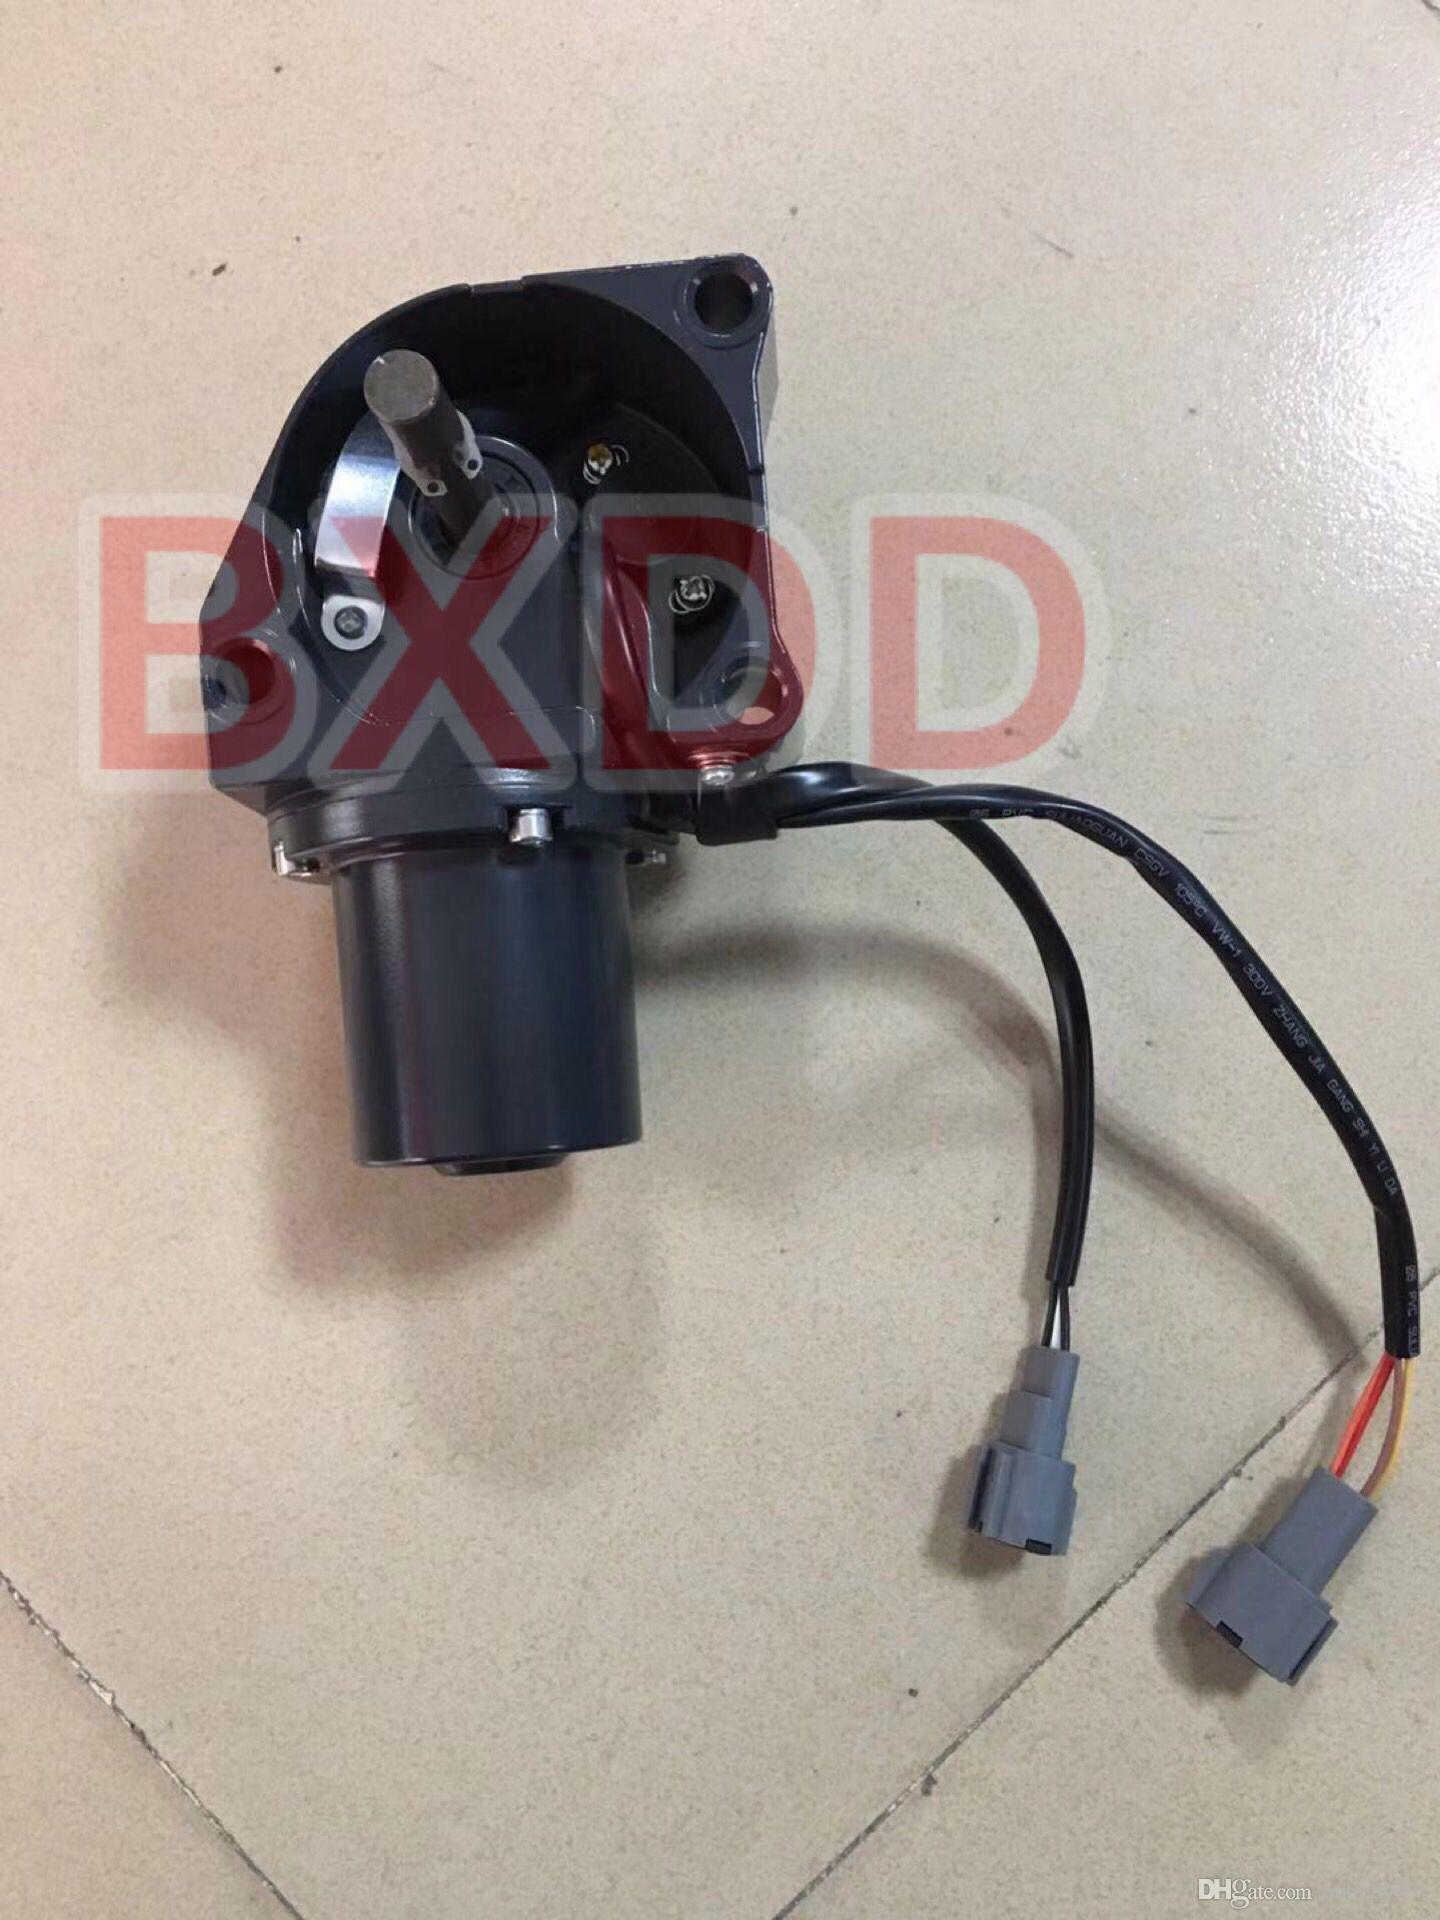 EX200-5 zax200-1 굴삭기 스로틀 모터 4614911 히타치 굴착기